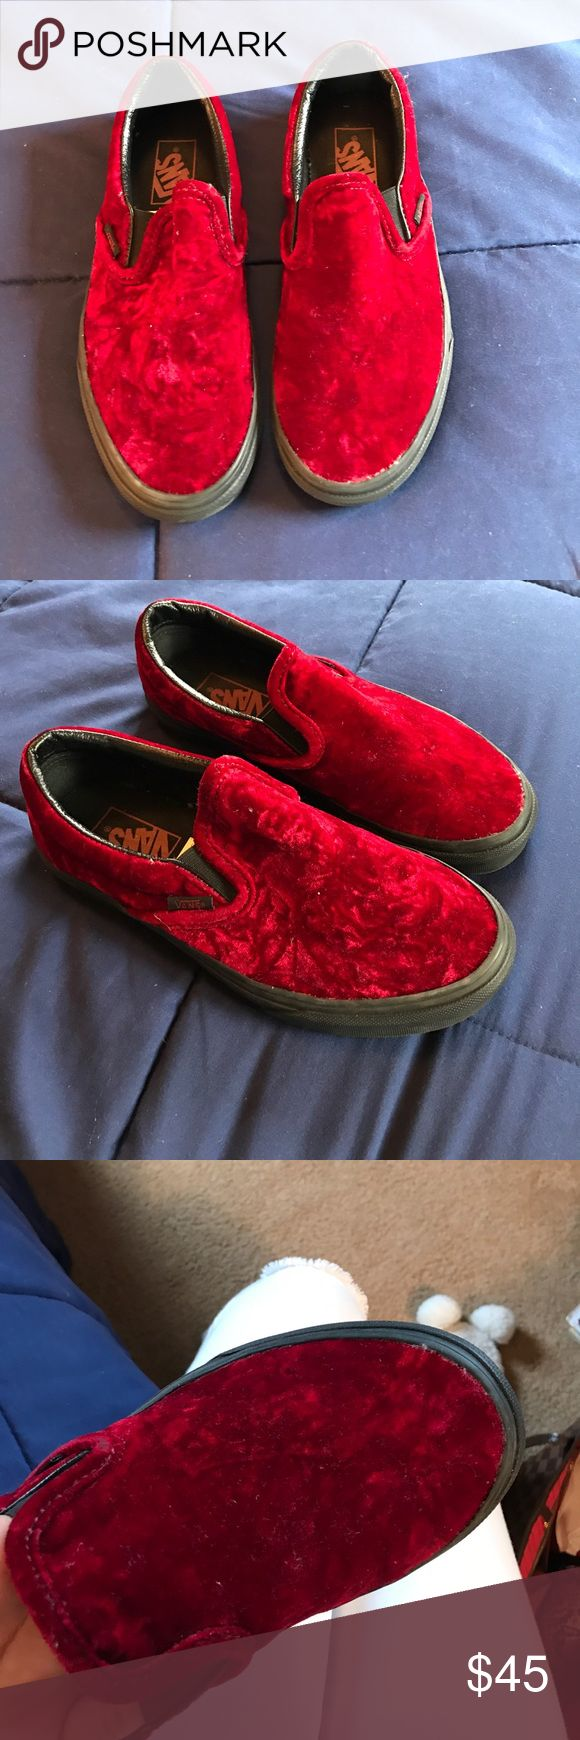 Vans Velvet Red Never worn Velvet Red Vans tennis shoes Vans Shoes Sneakers